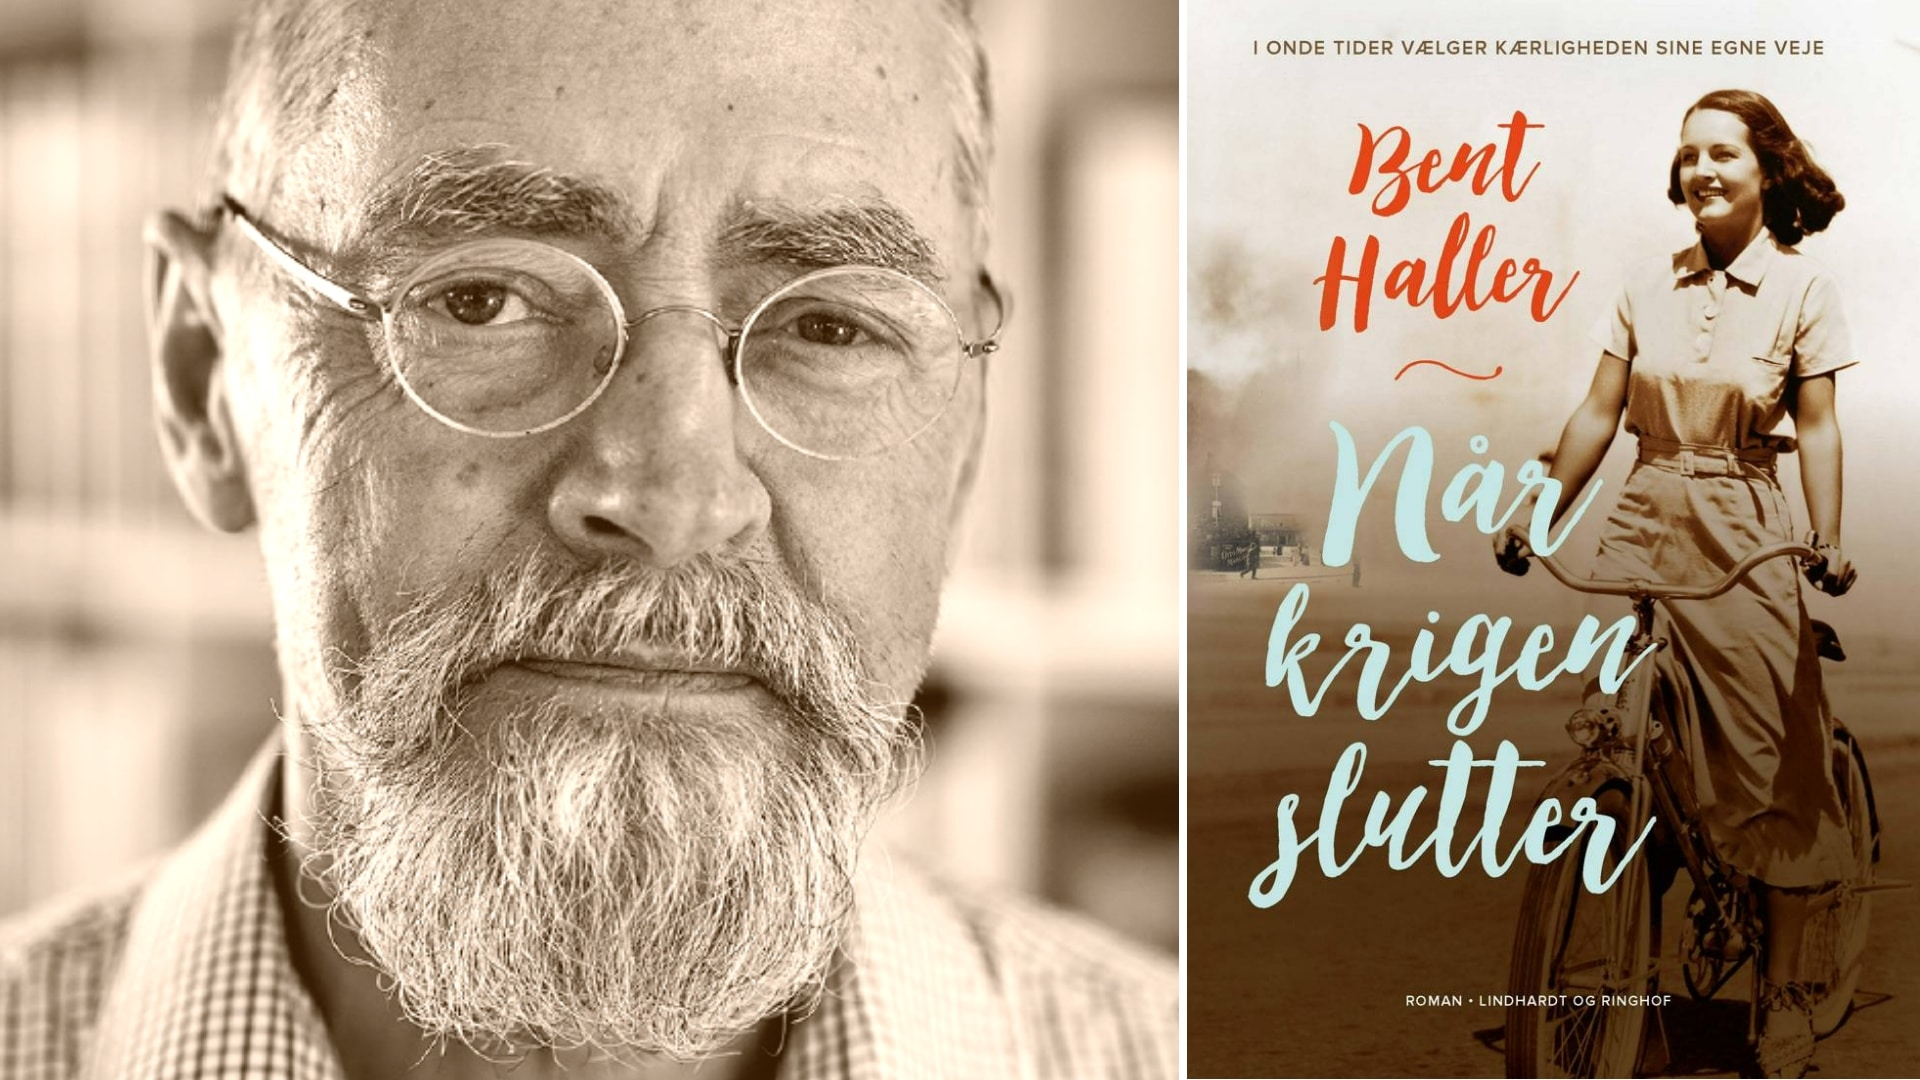 Bent Haller, Når krigen slutter, interview Bent Haller